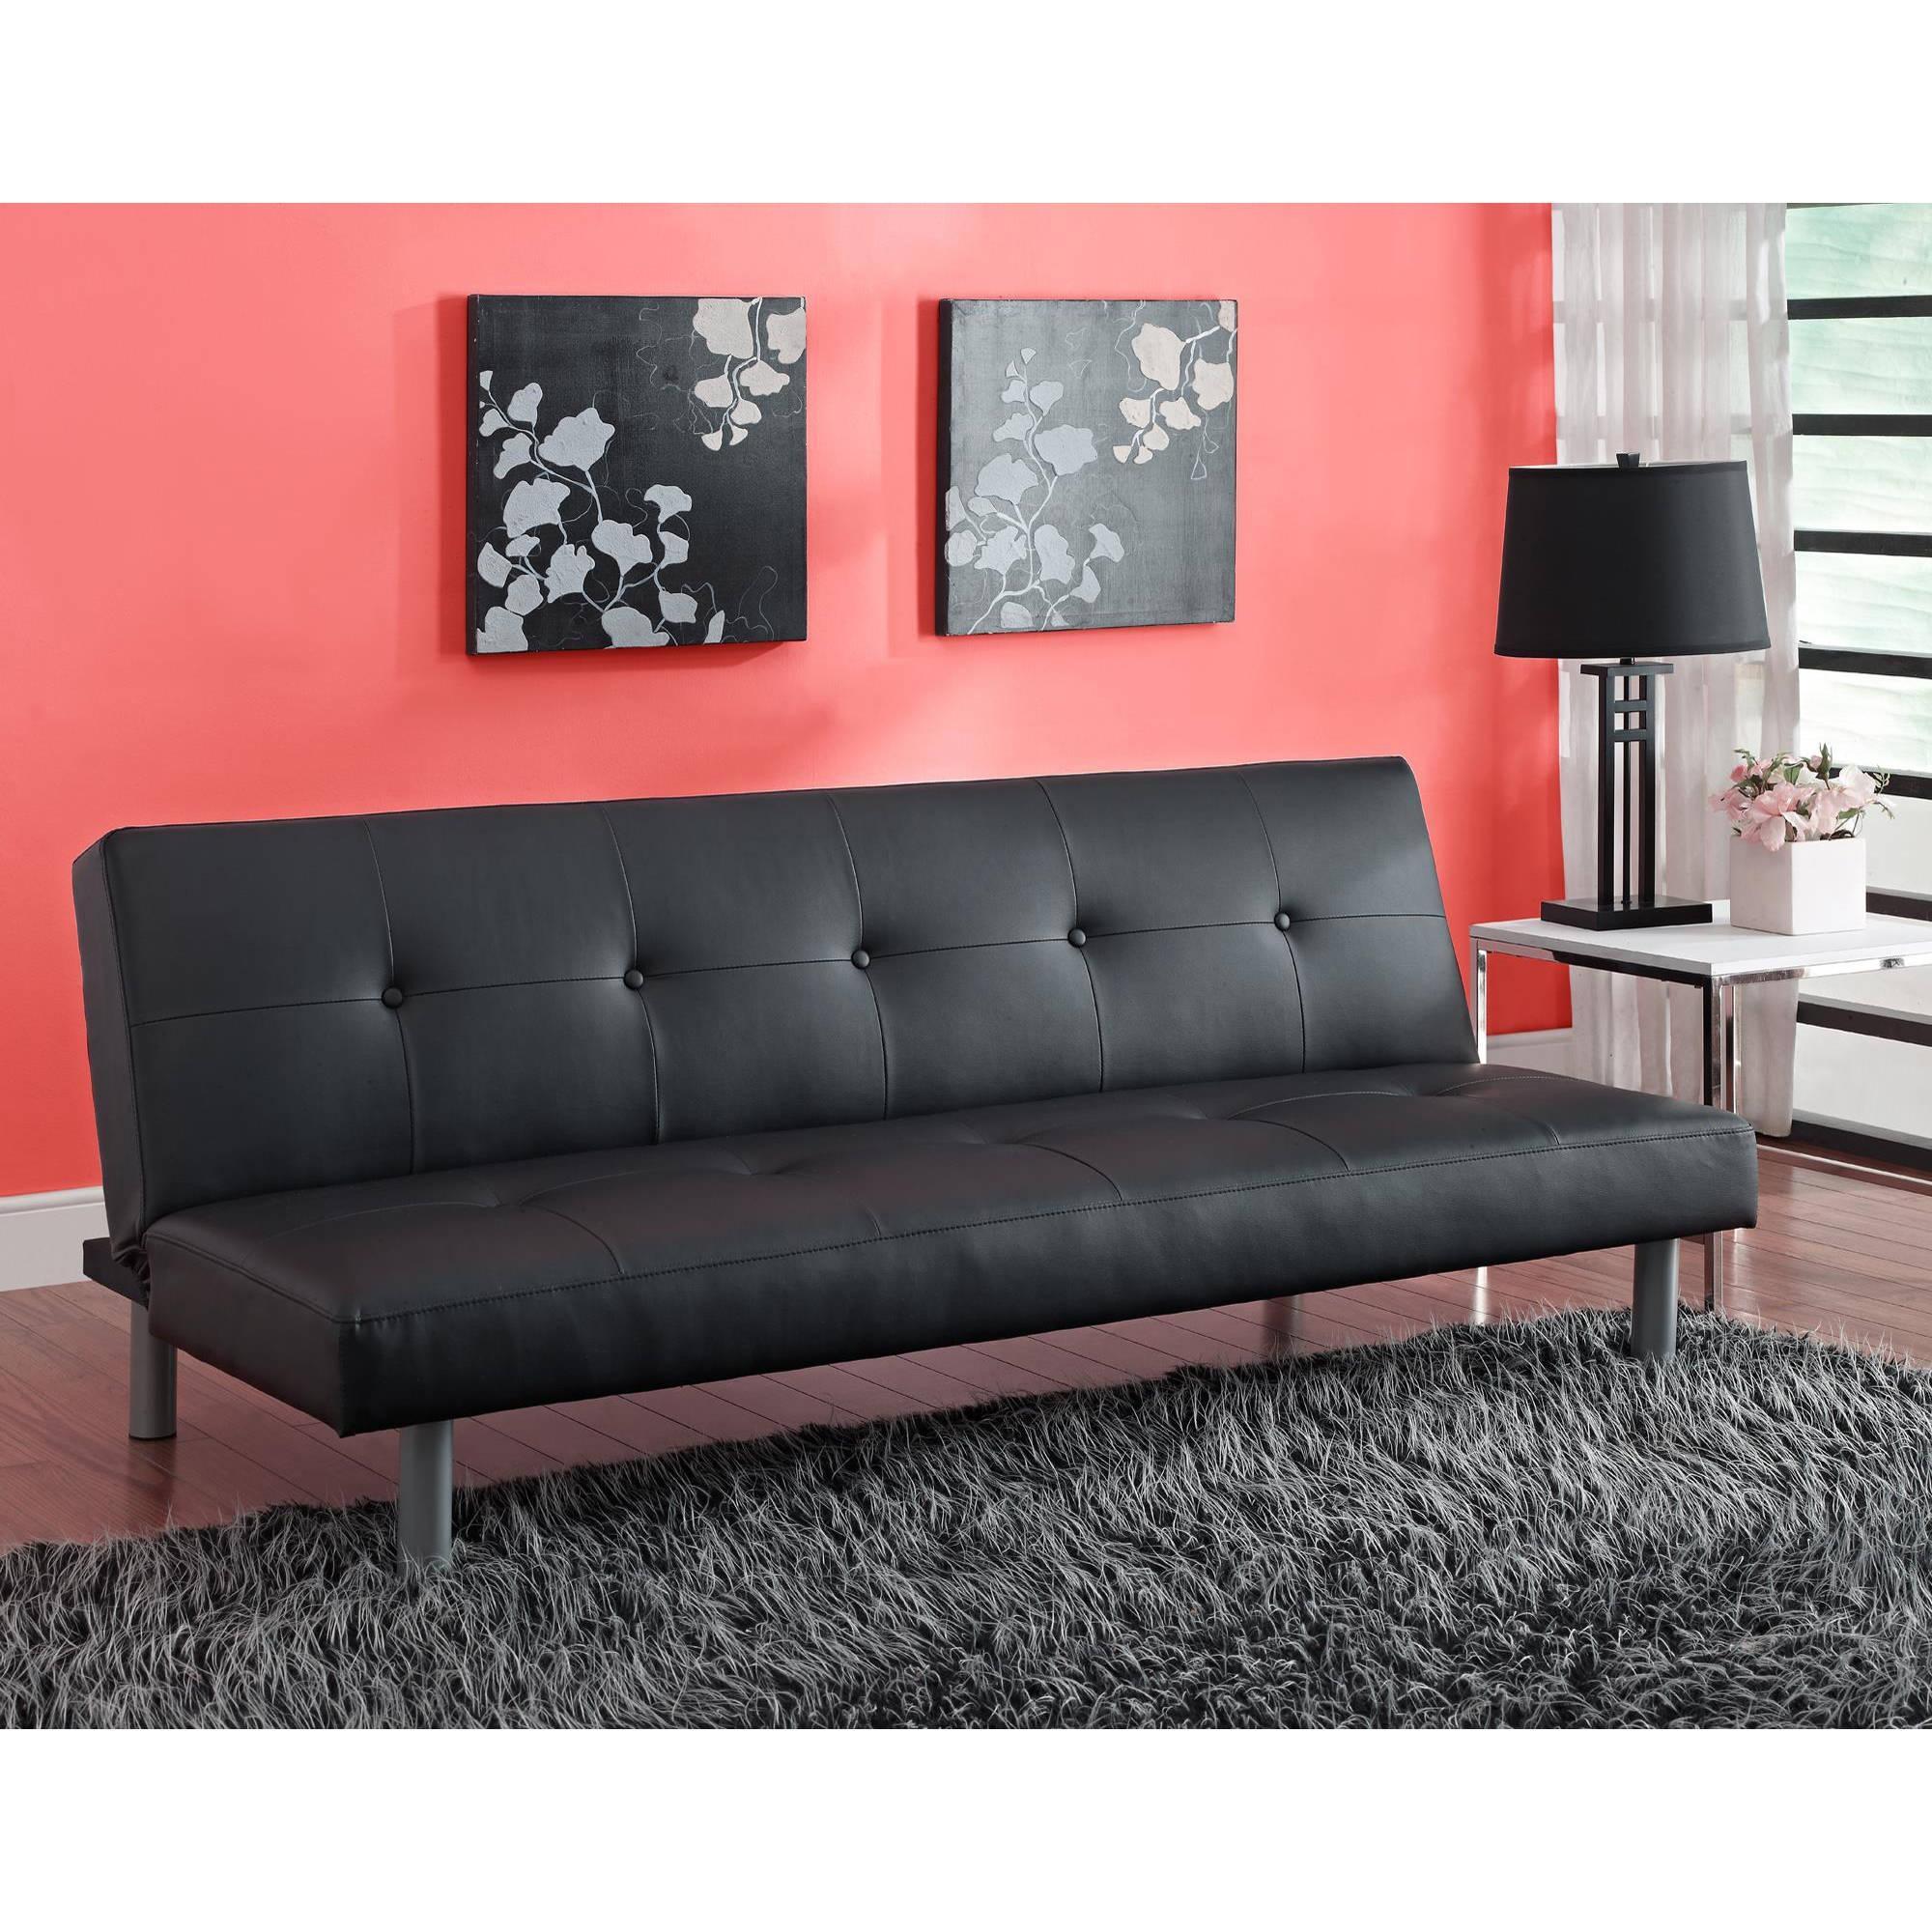 Furniture: Target Futons | Futon Beds Walmart | Couch Bed Walmart Pertaining To Target Couch Beds (Image 8 of 20)